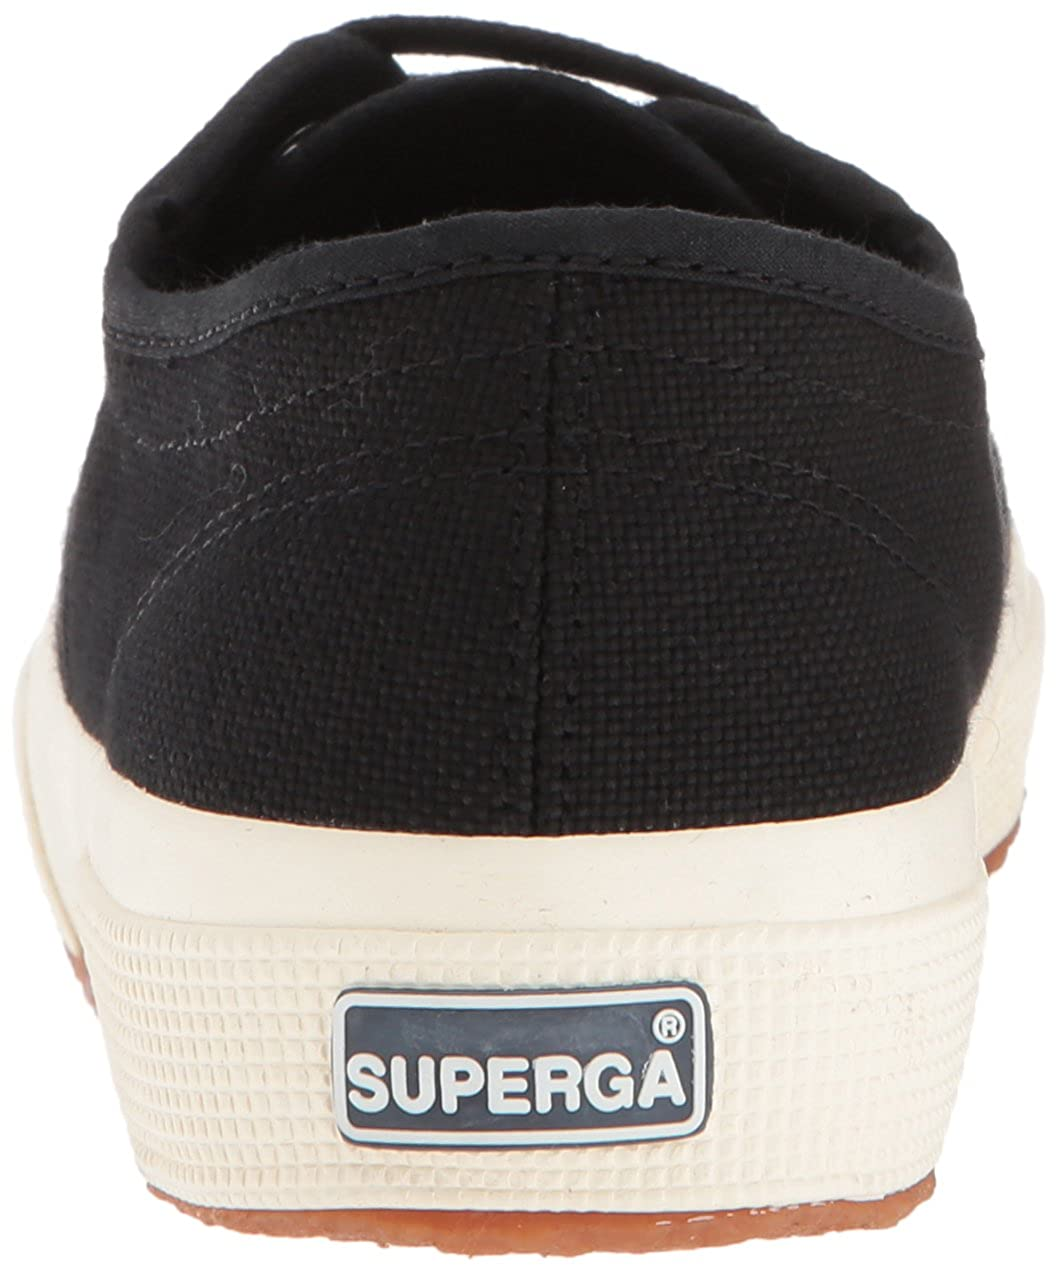 Superga Unisex Erwachsene Schwarz 2750 Cotu Classic Niedrig Top, Navy Schwarz Erwachsene (schwarz S) 2180fc